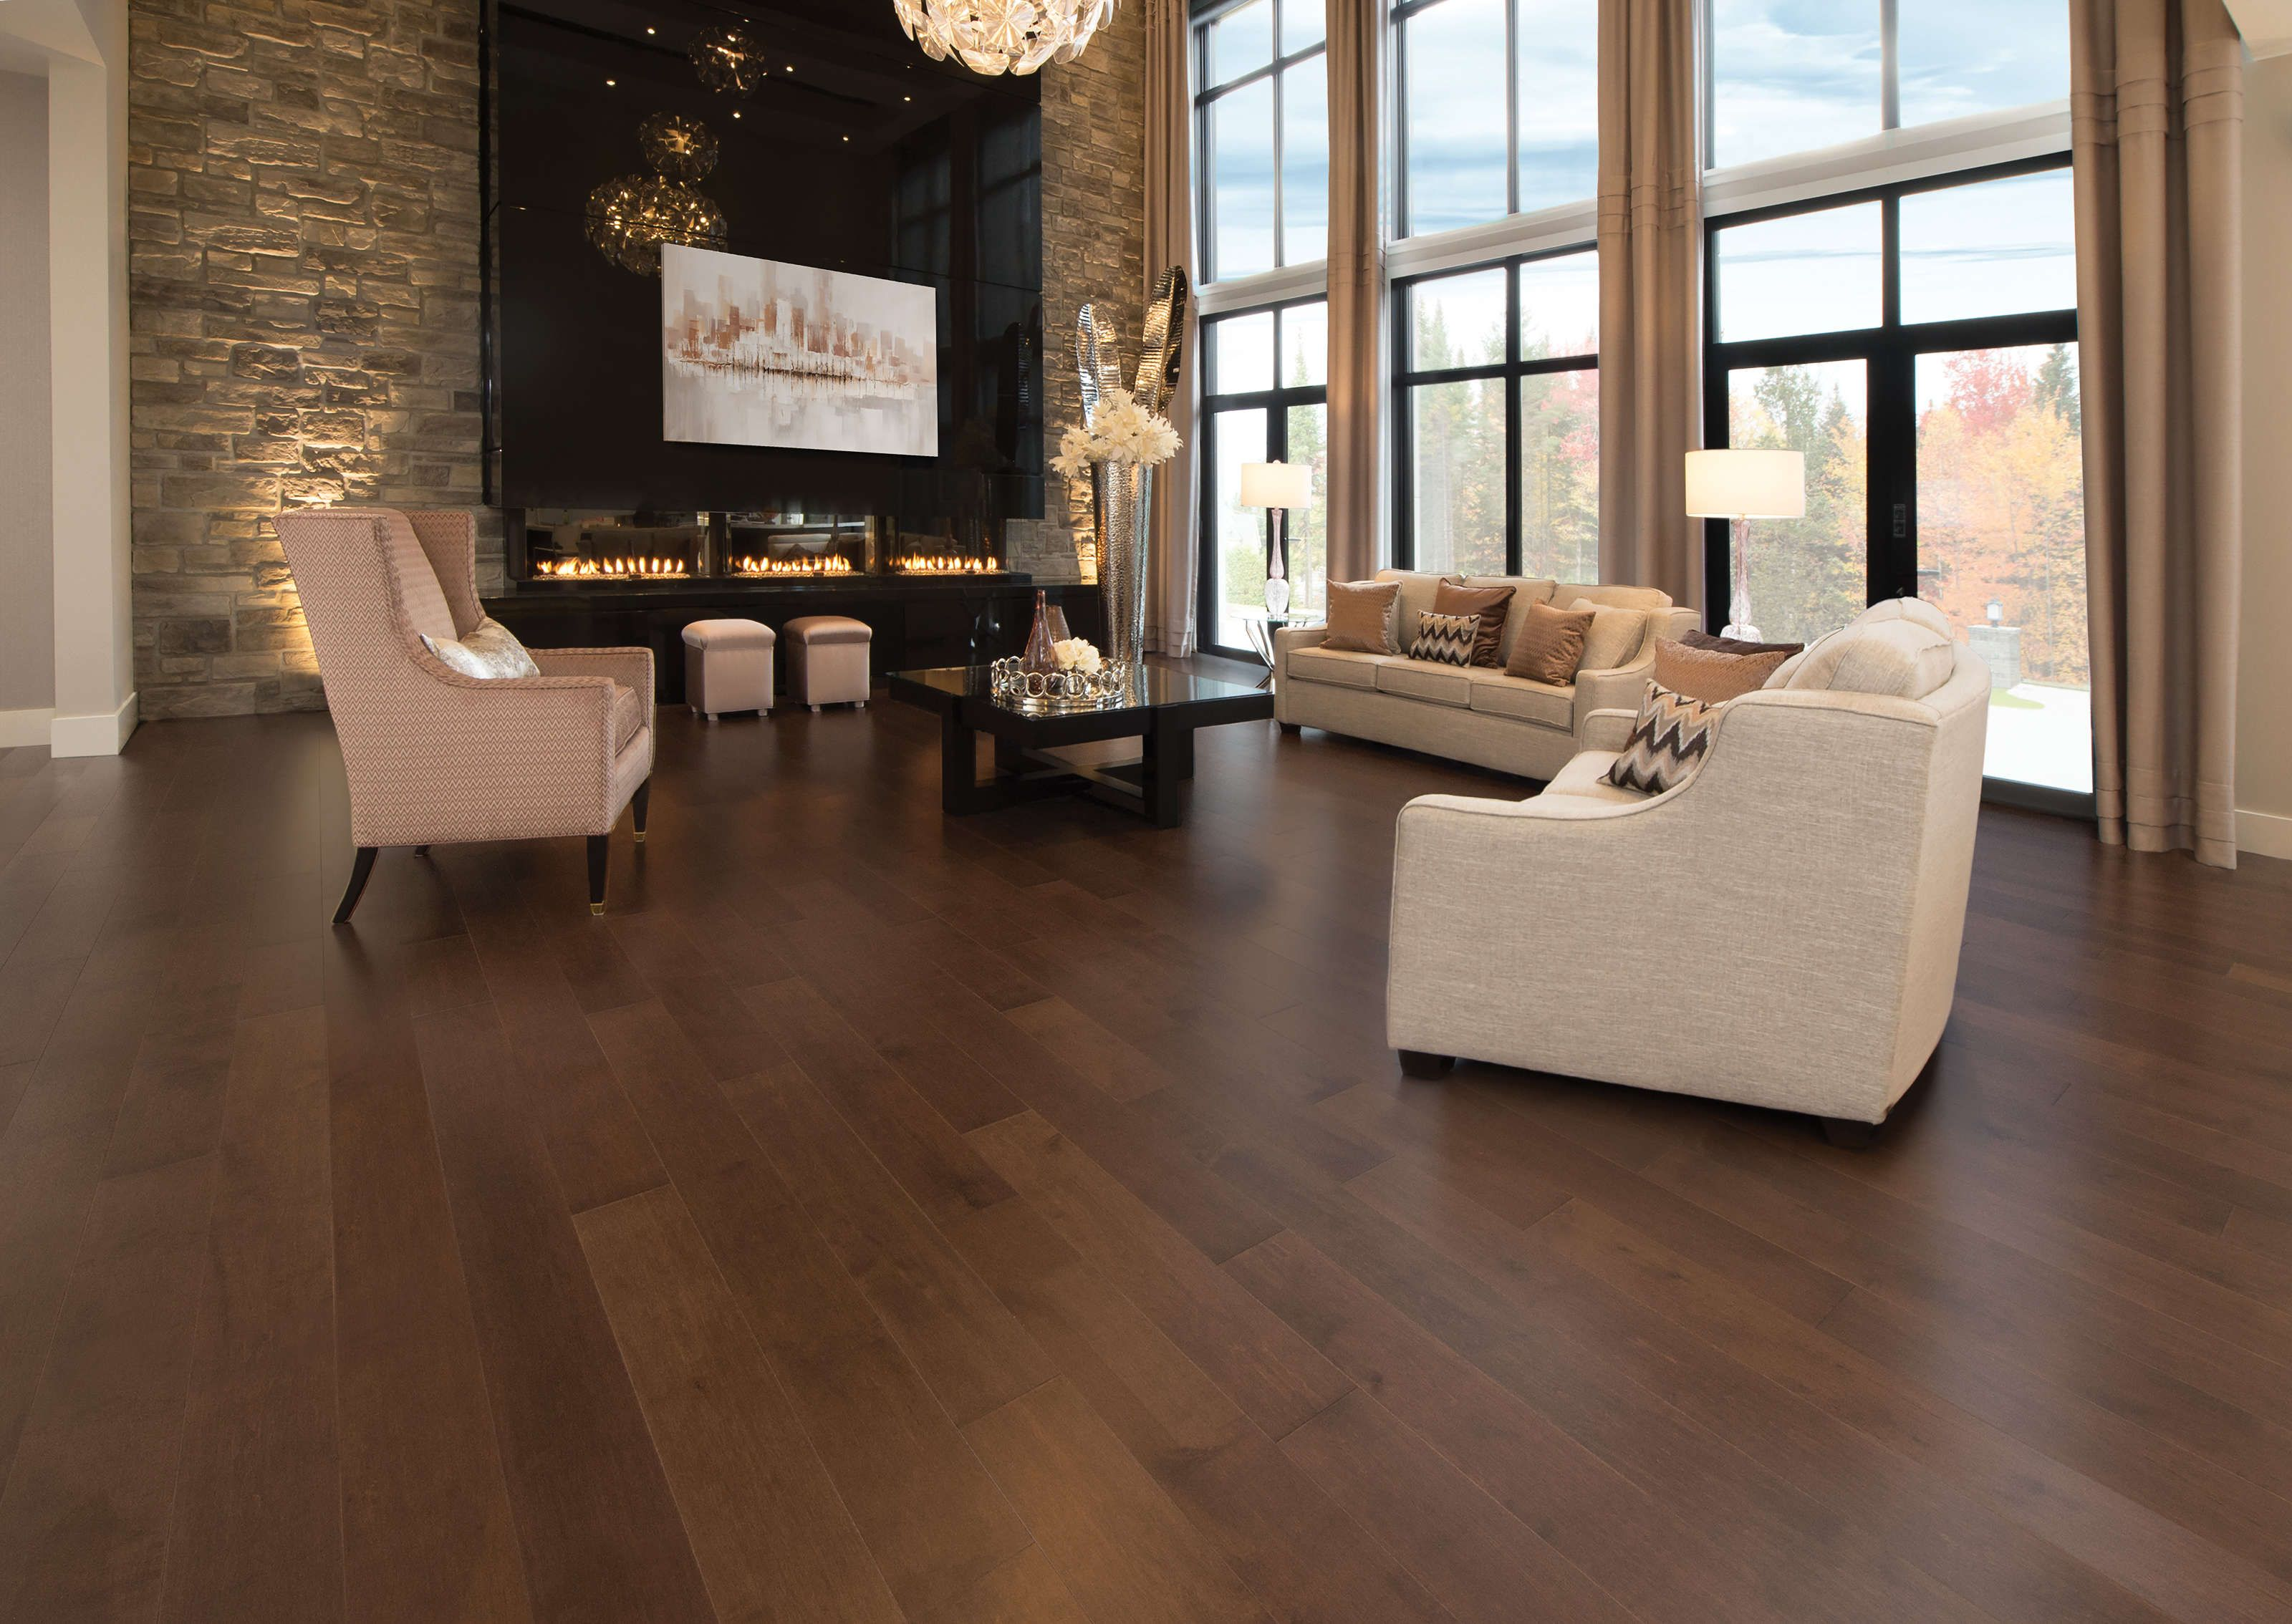 best kitchens donatz home floors design stunning floor simple white hardwood for info on kitchen and